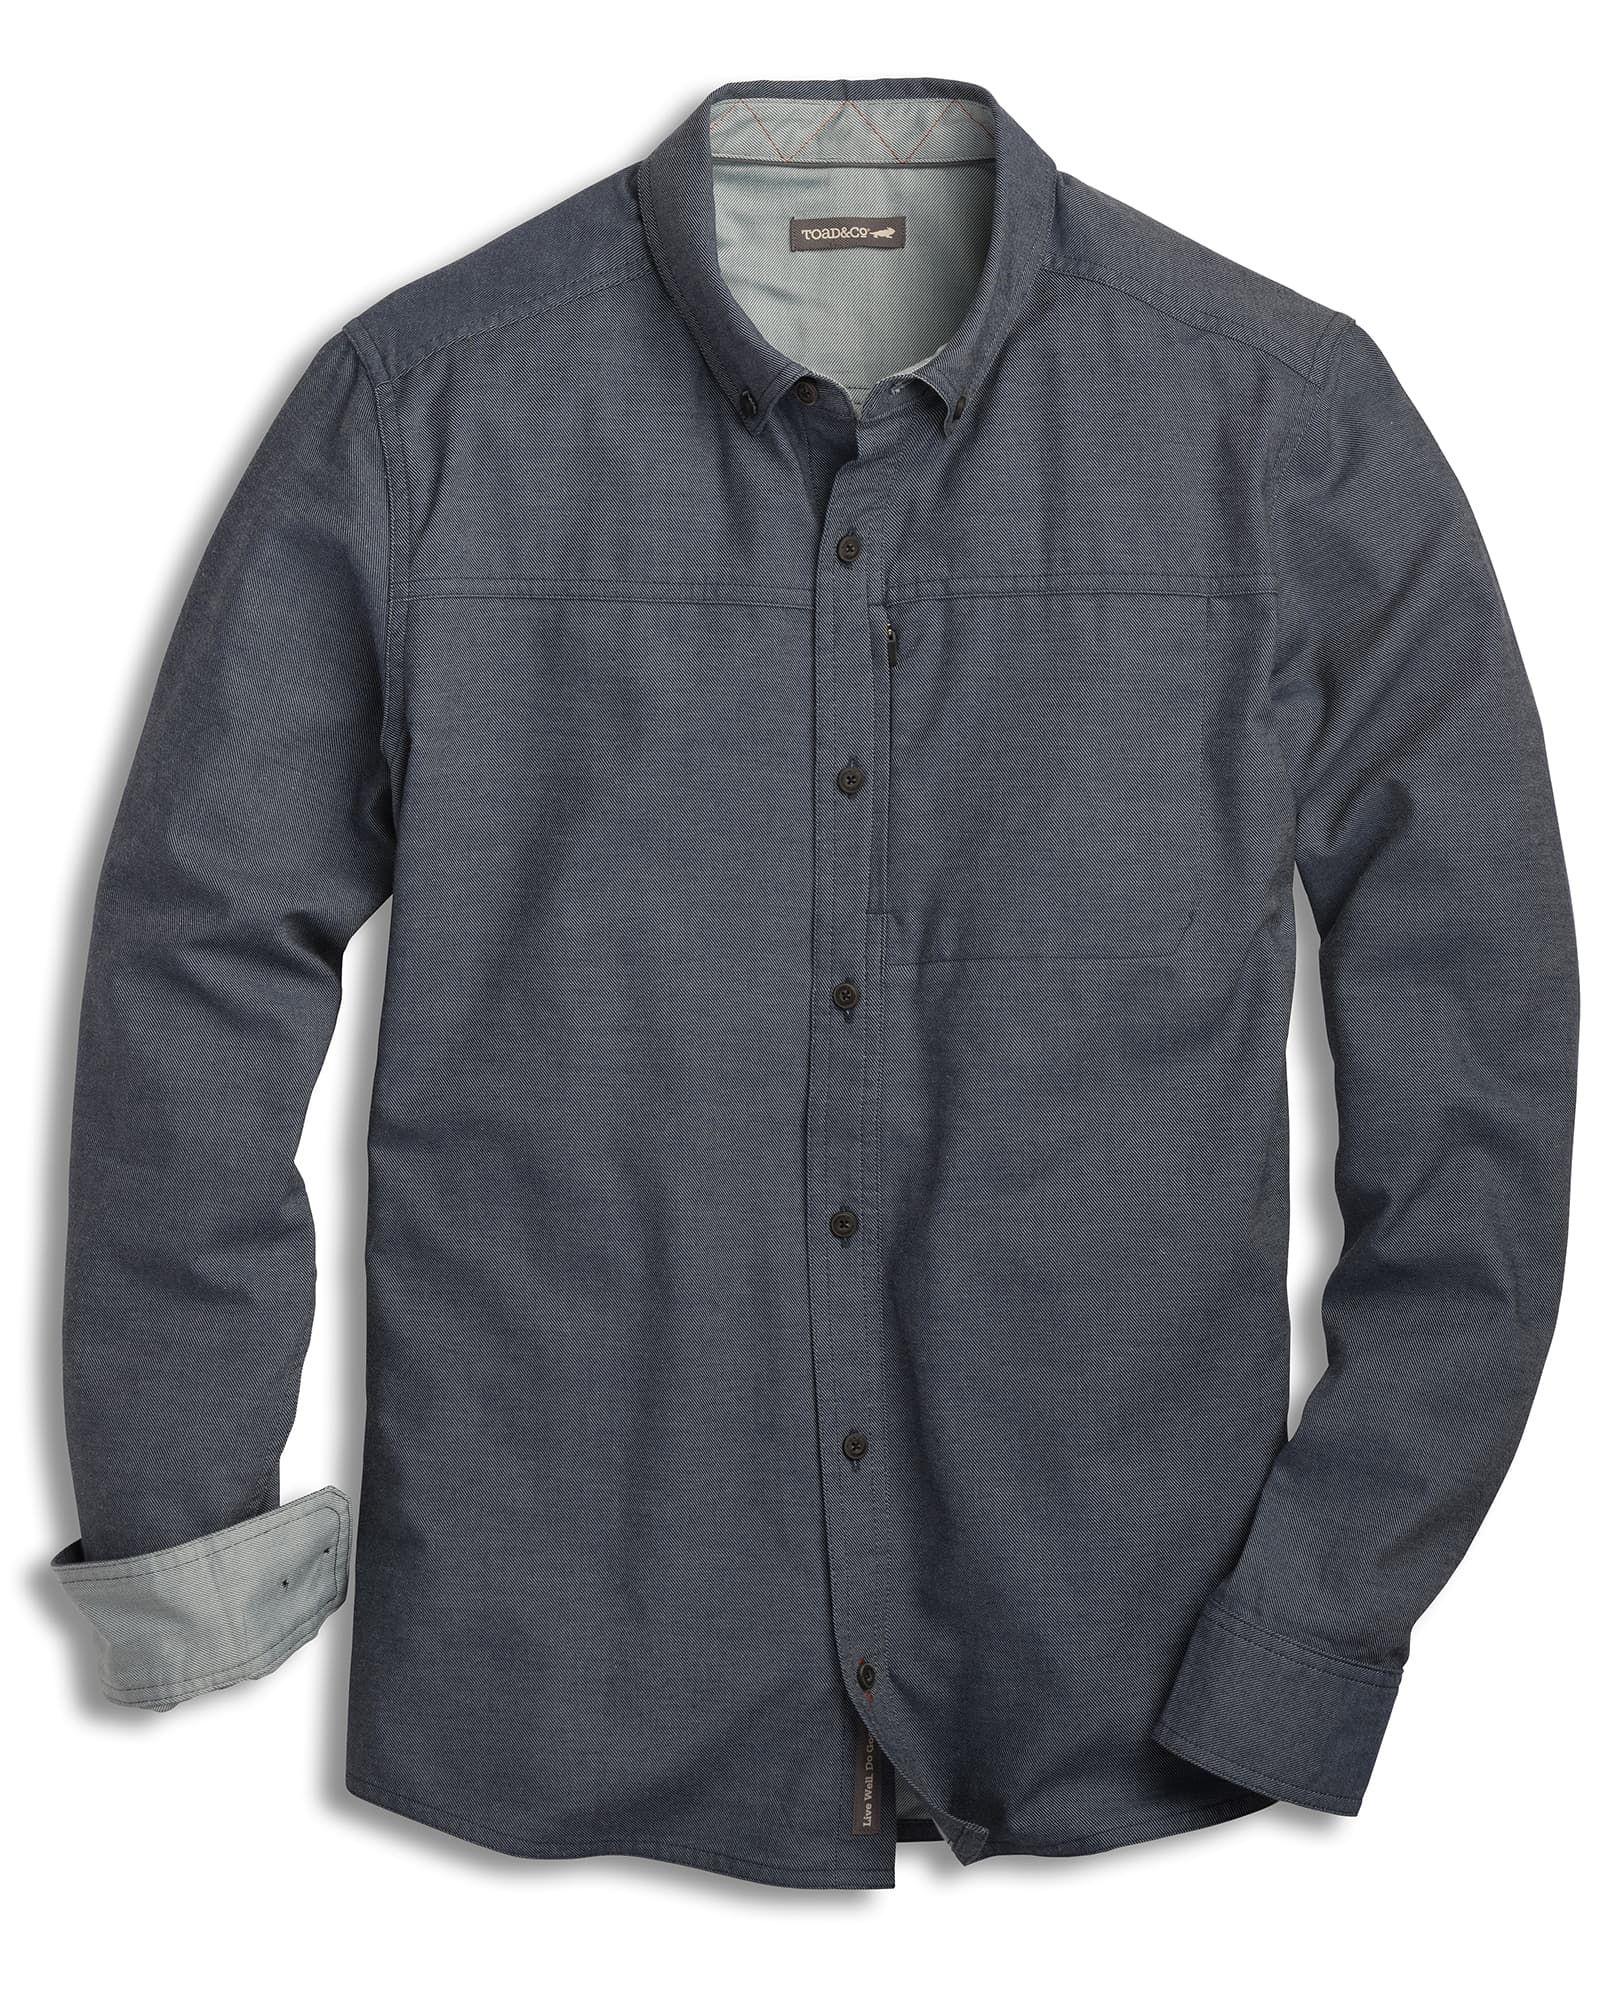 G-STAR RAW Stalt Button Down Pocket Straight Camicia in Jeans Uomo